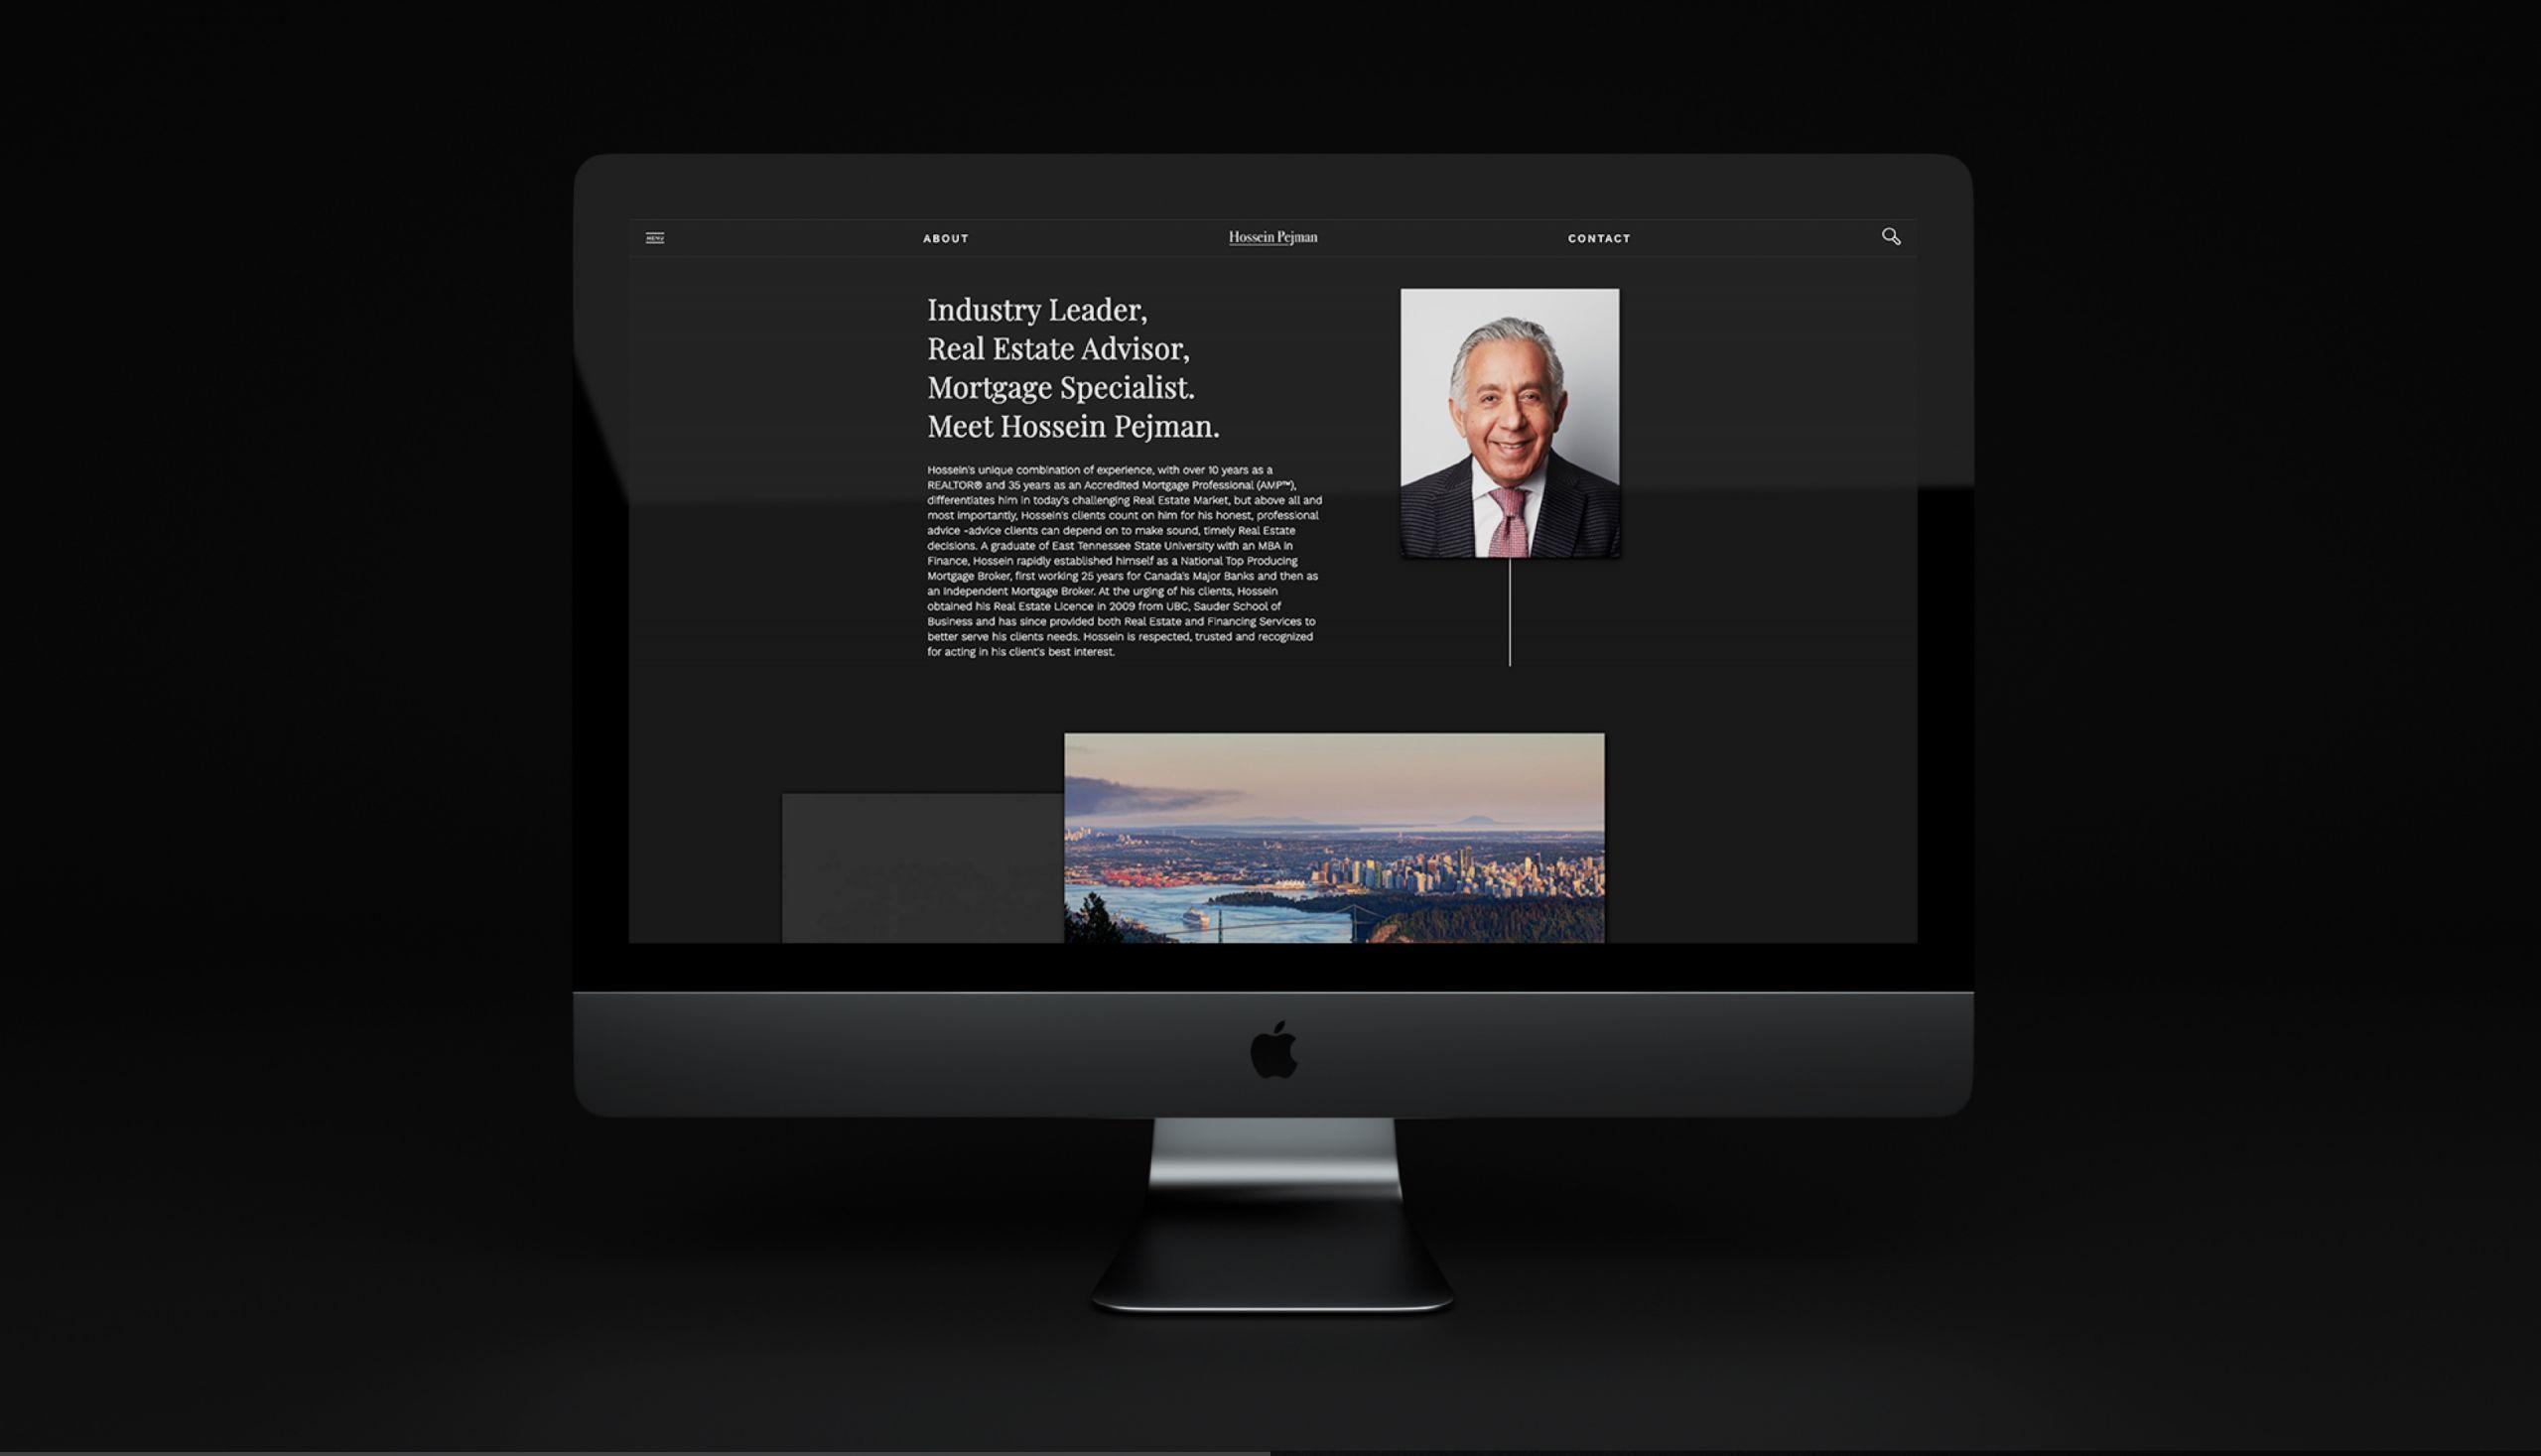 Custom designed website homepage for Real Estate Agent